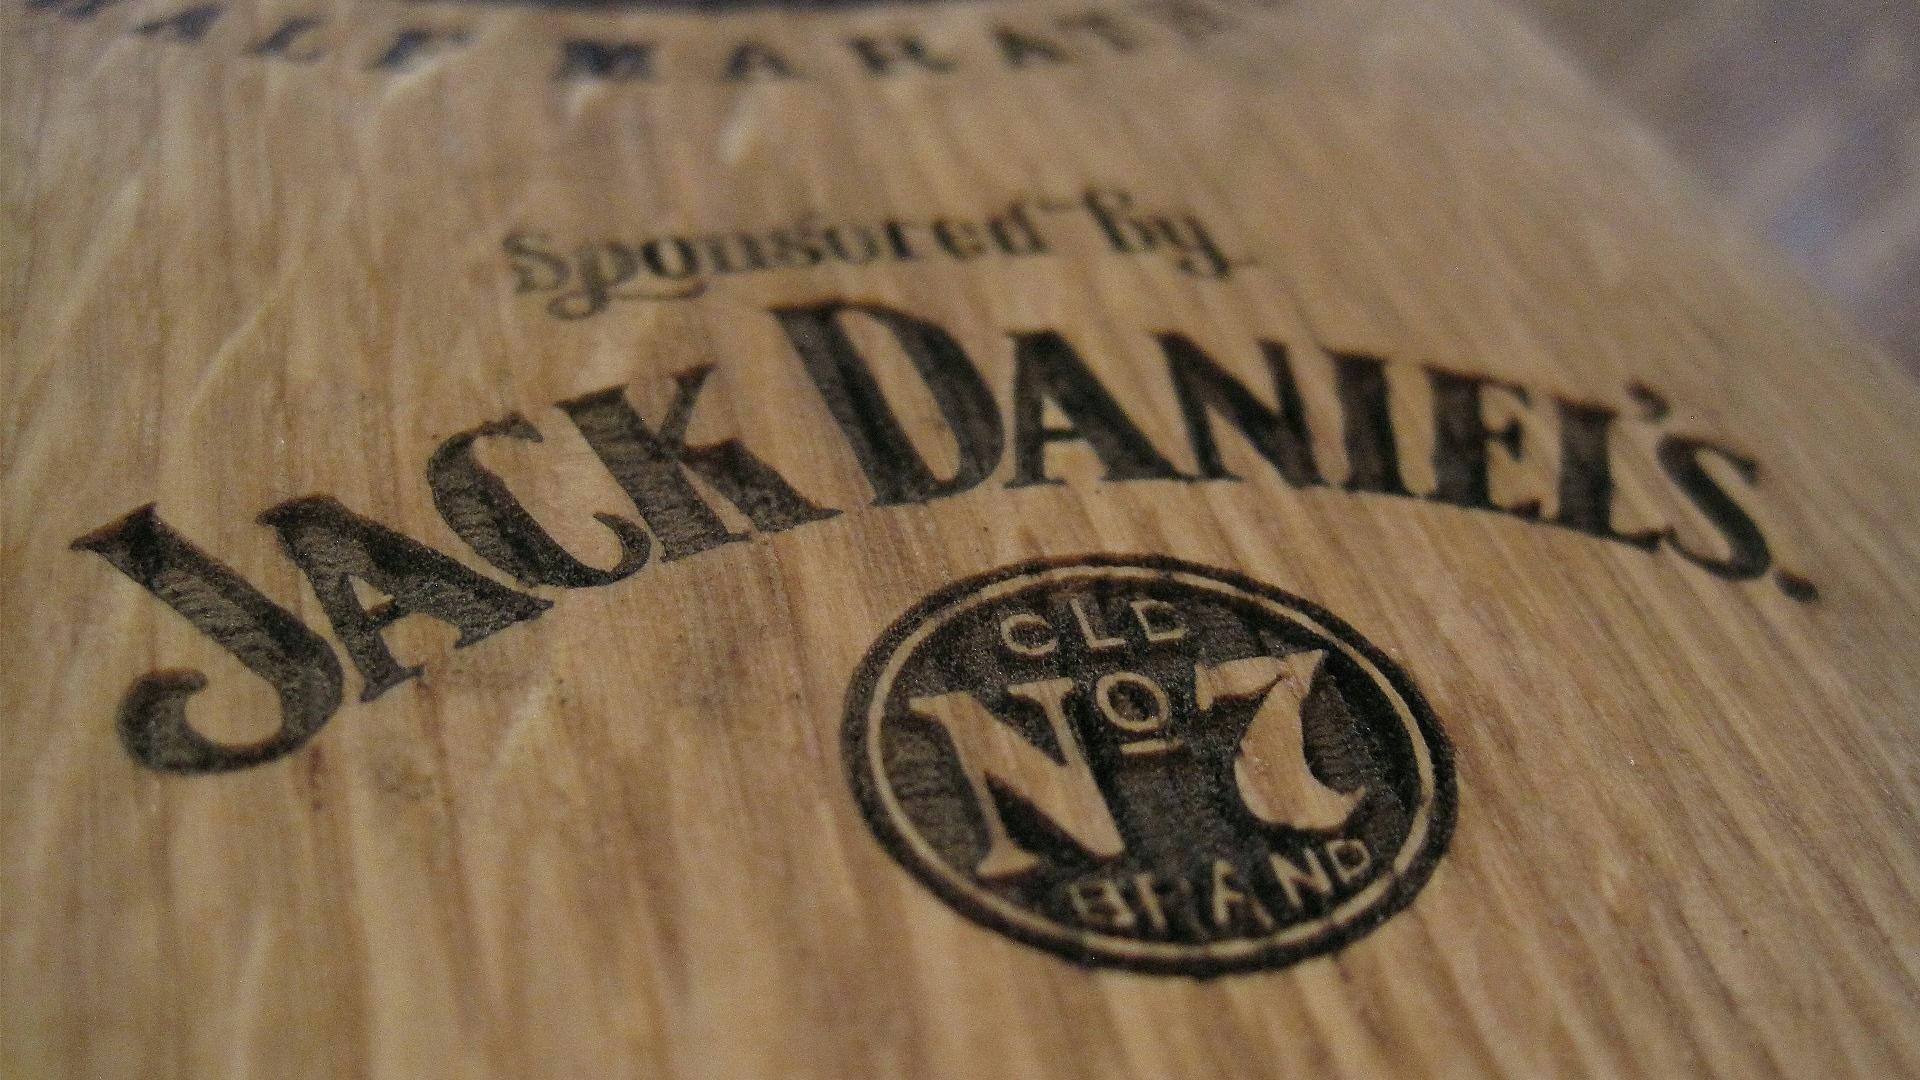 Sponsored by Jack Daniel's Old No. 7